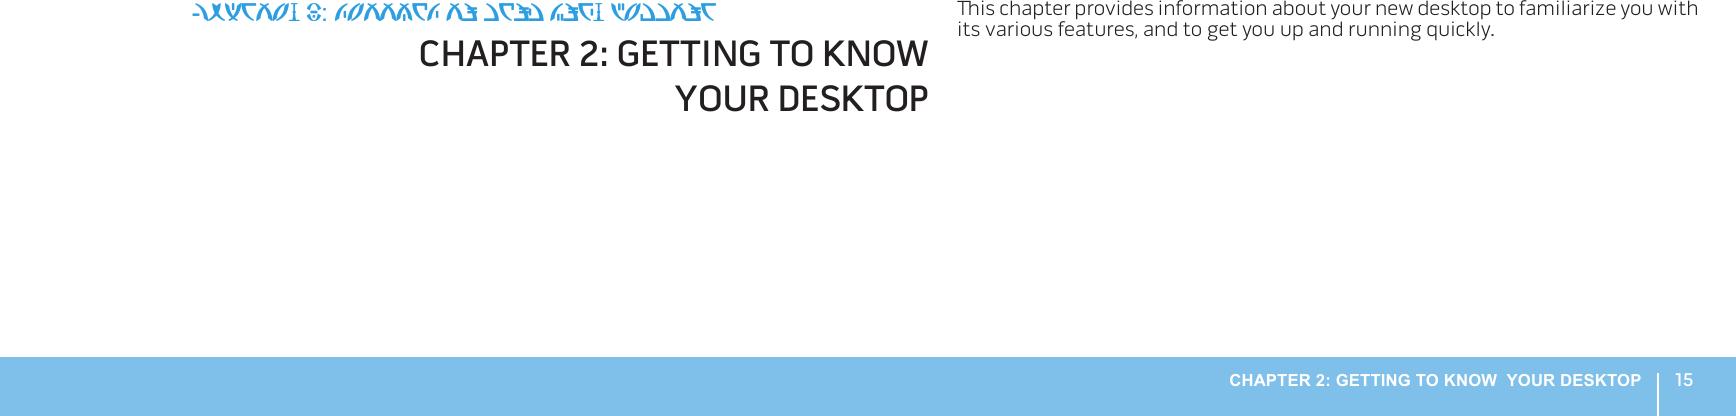 Dell Alienware aurora alx Desktop Manual User User's Guide En us